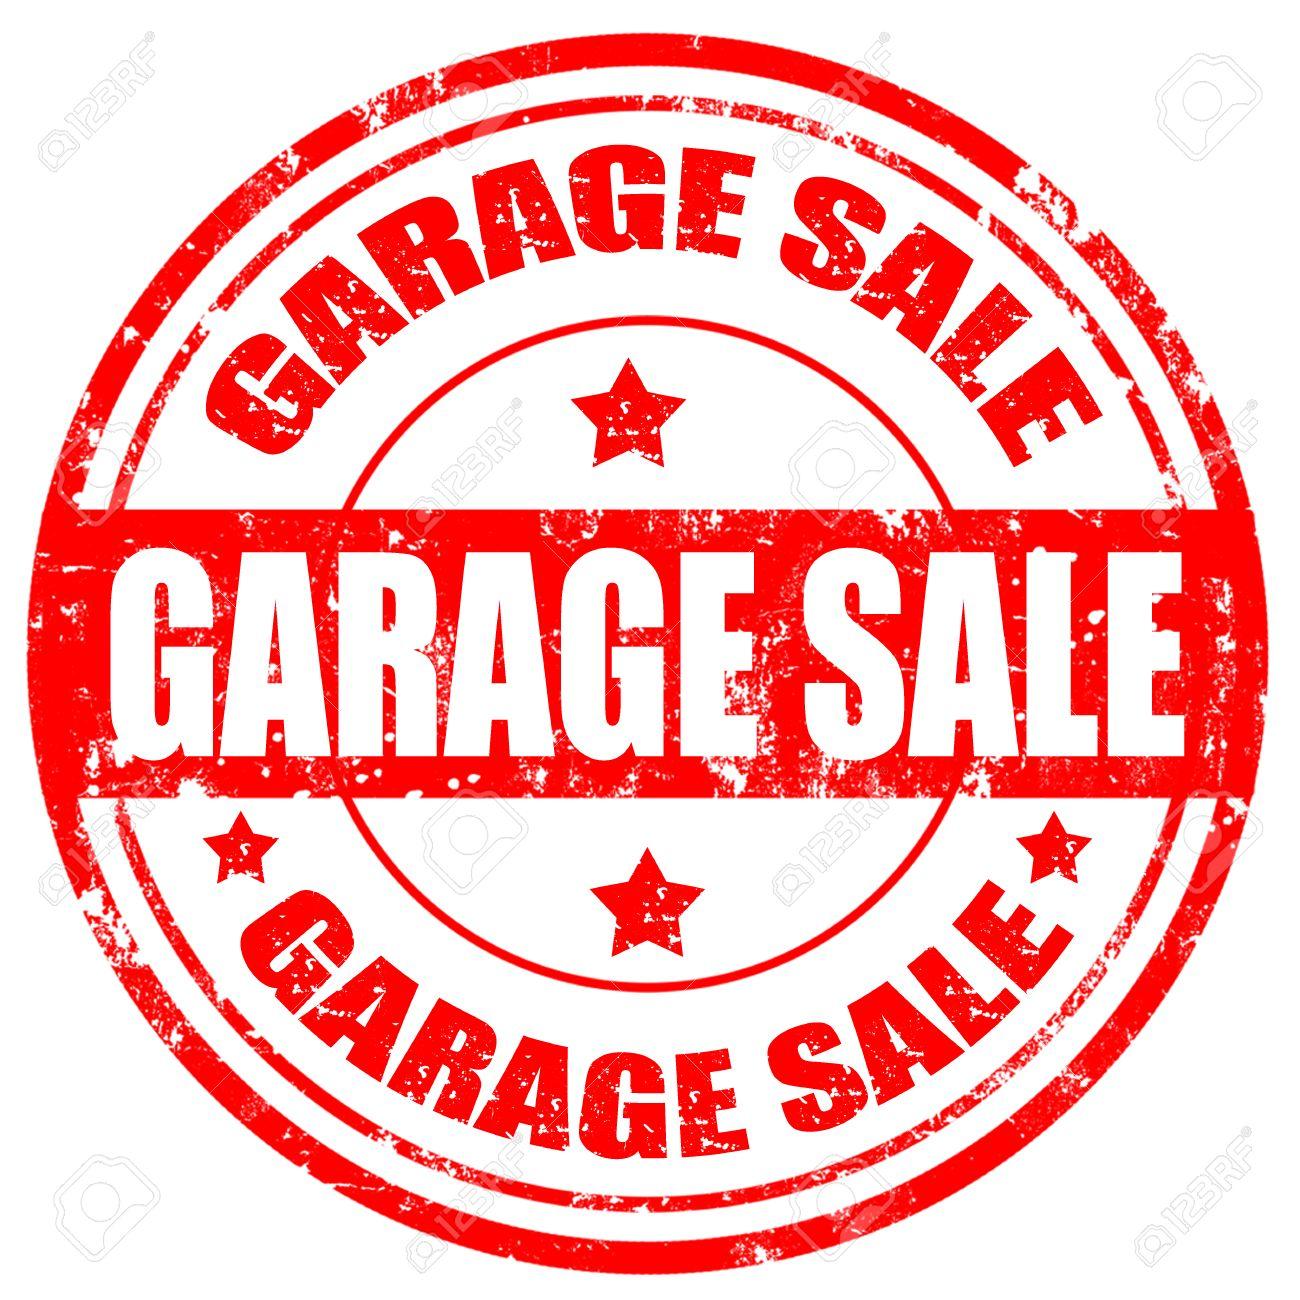 Grunge rubber stamp with text Garage Sale,vector illustration - 23225954